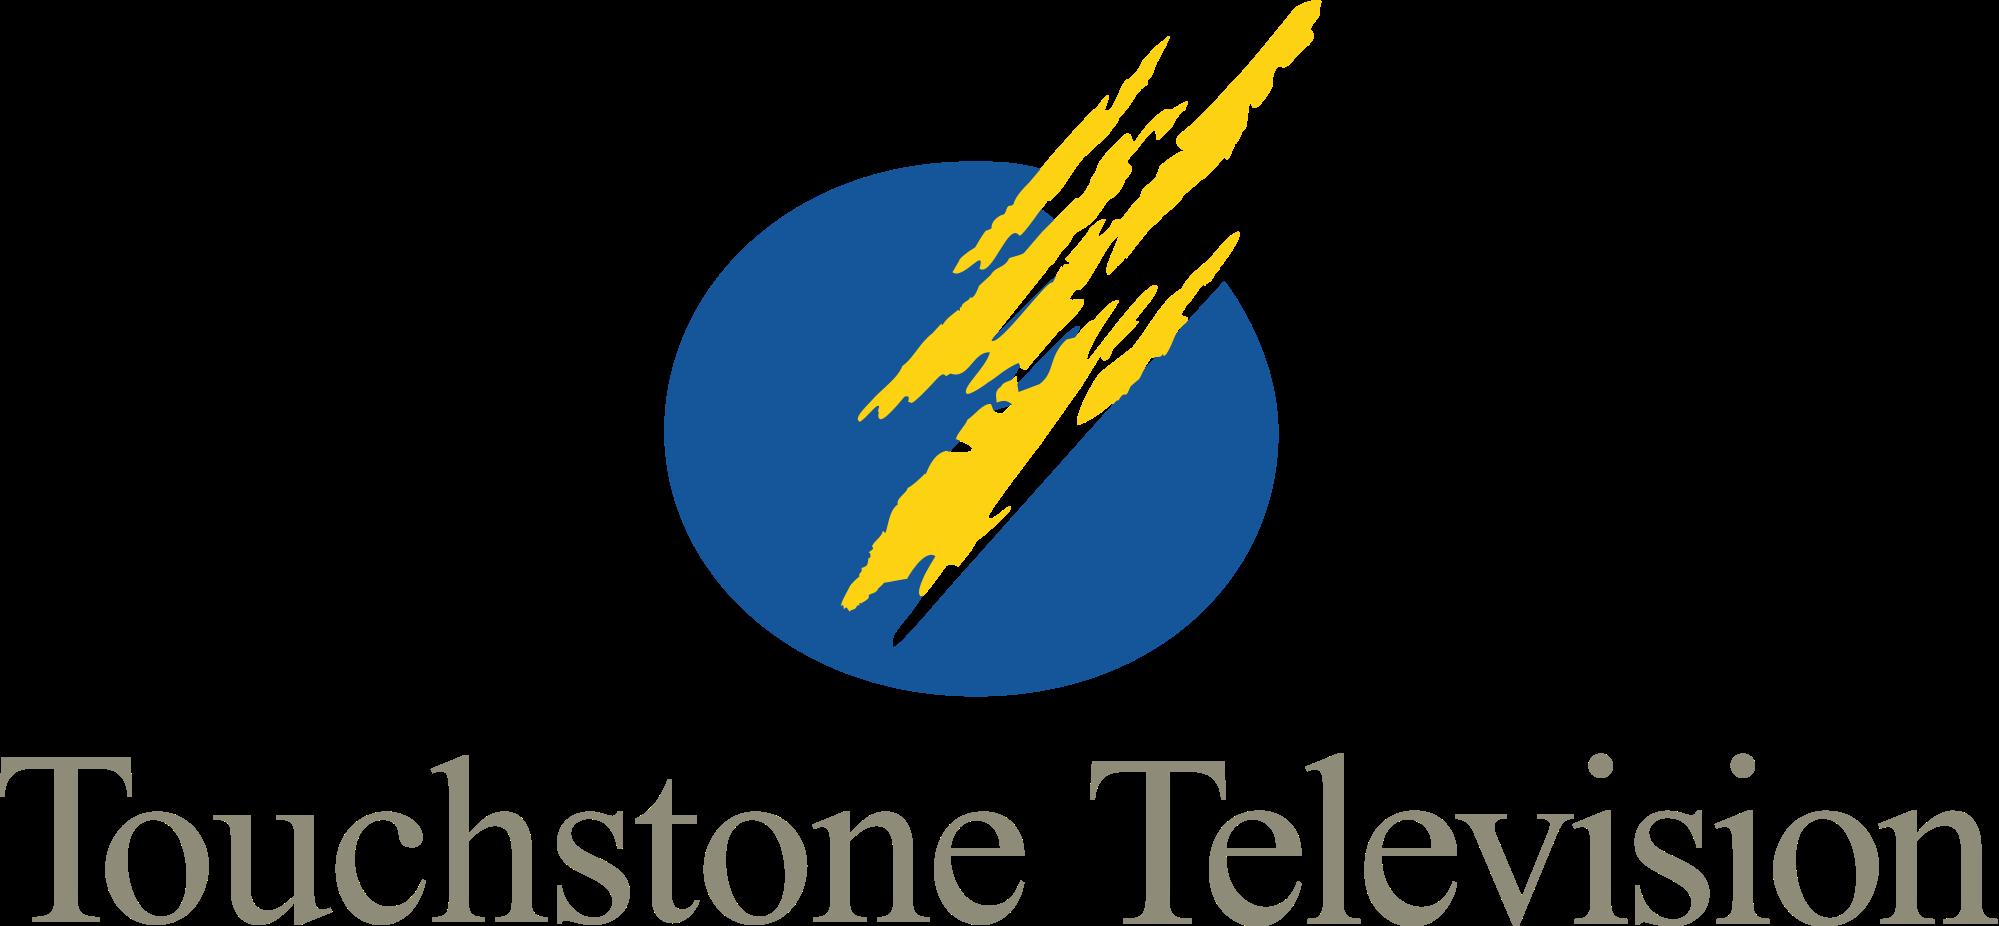 Touchstone Television